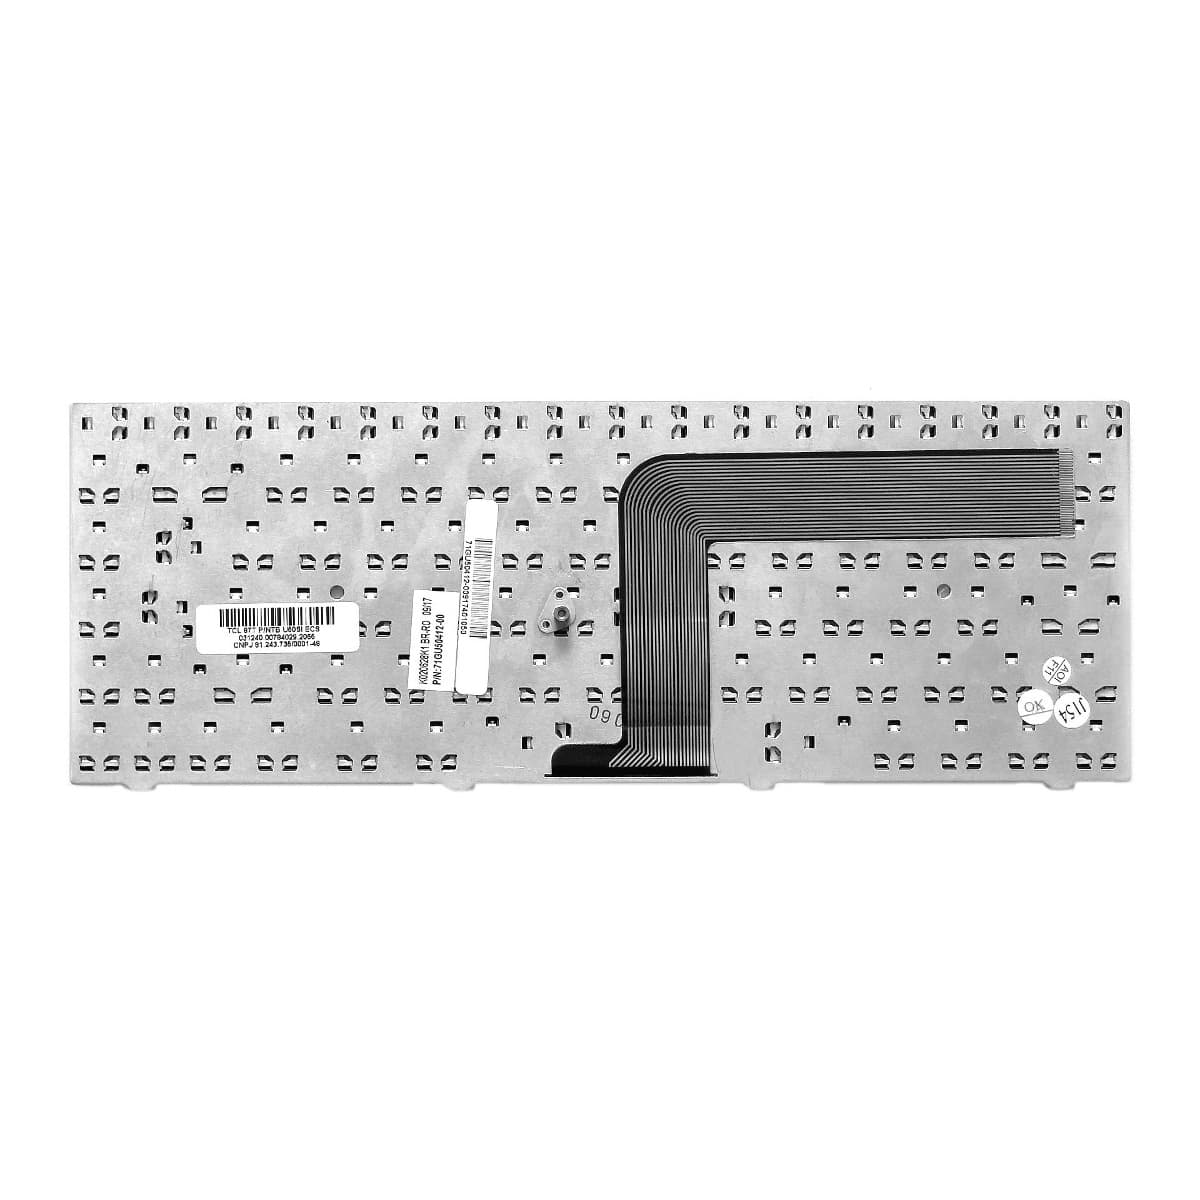 Teclado Notebook CCE Intelbras Pn: K020628K1 / 71GU50412-00